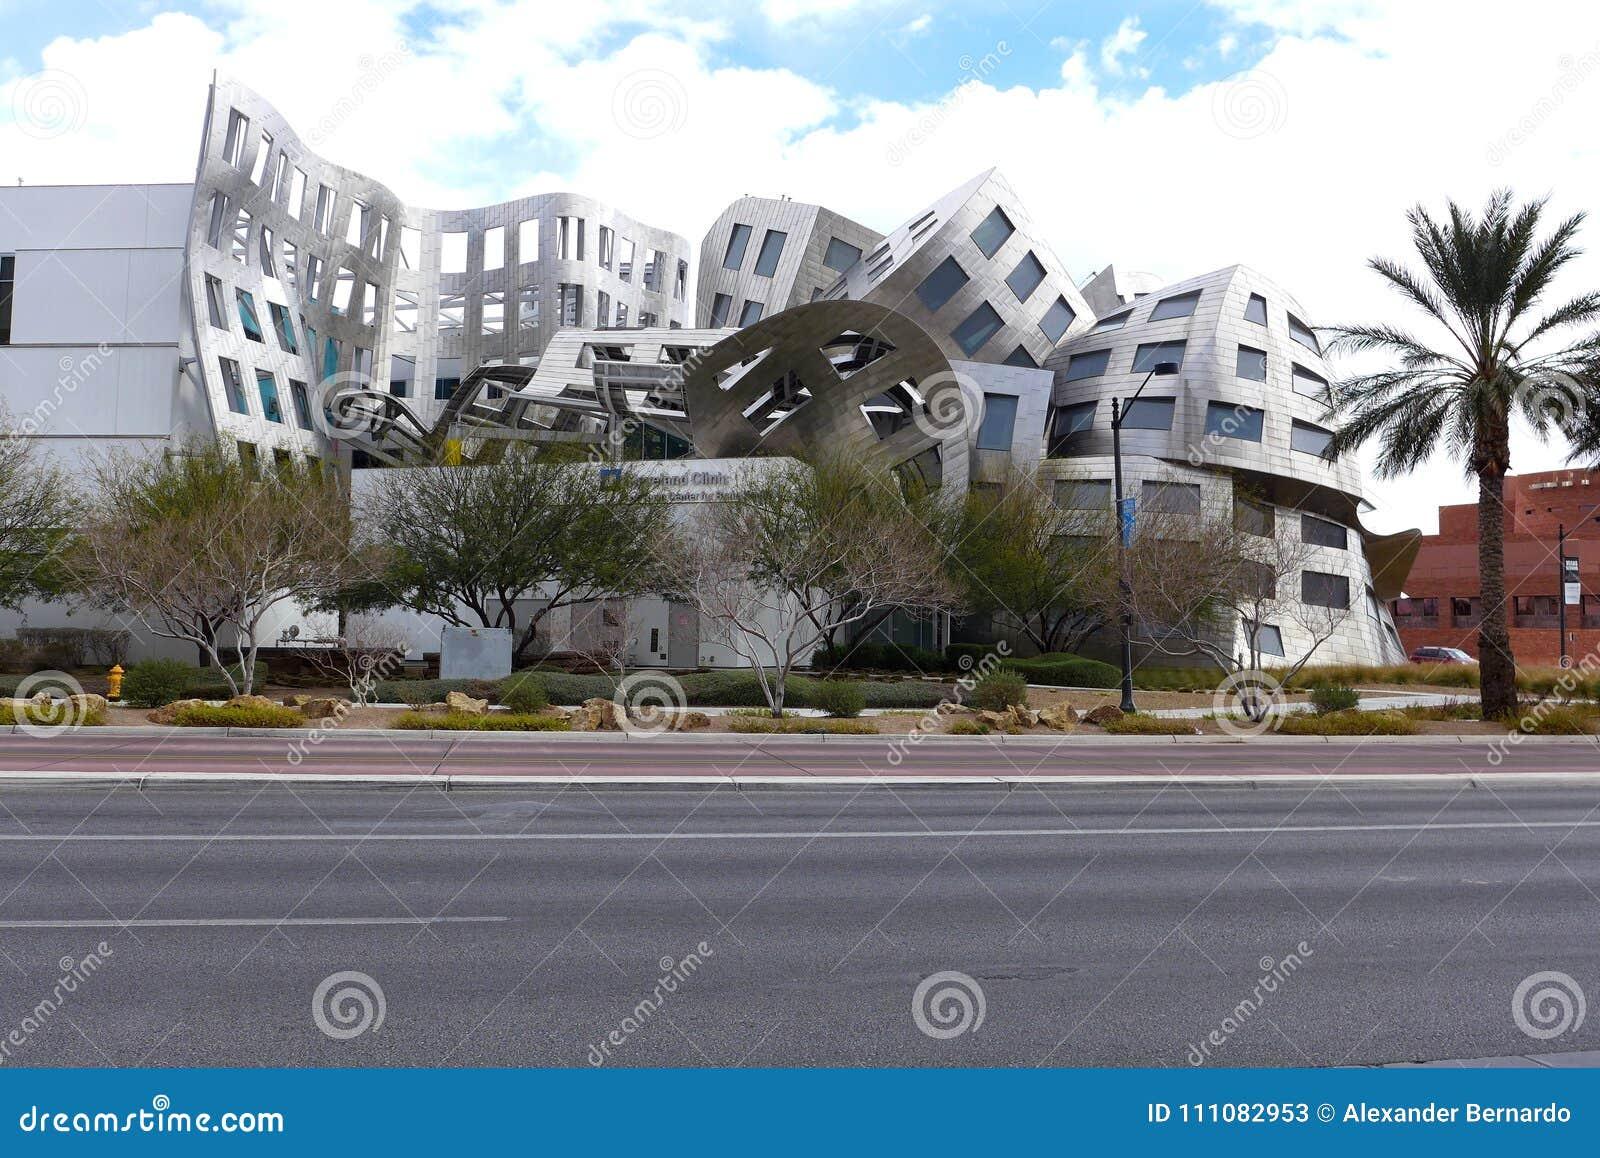 Edificio en Las Vegas céntrico